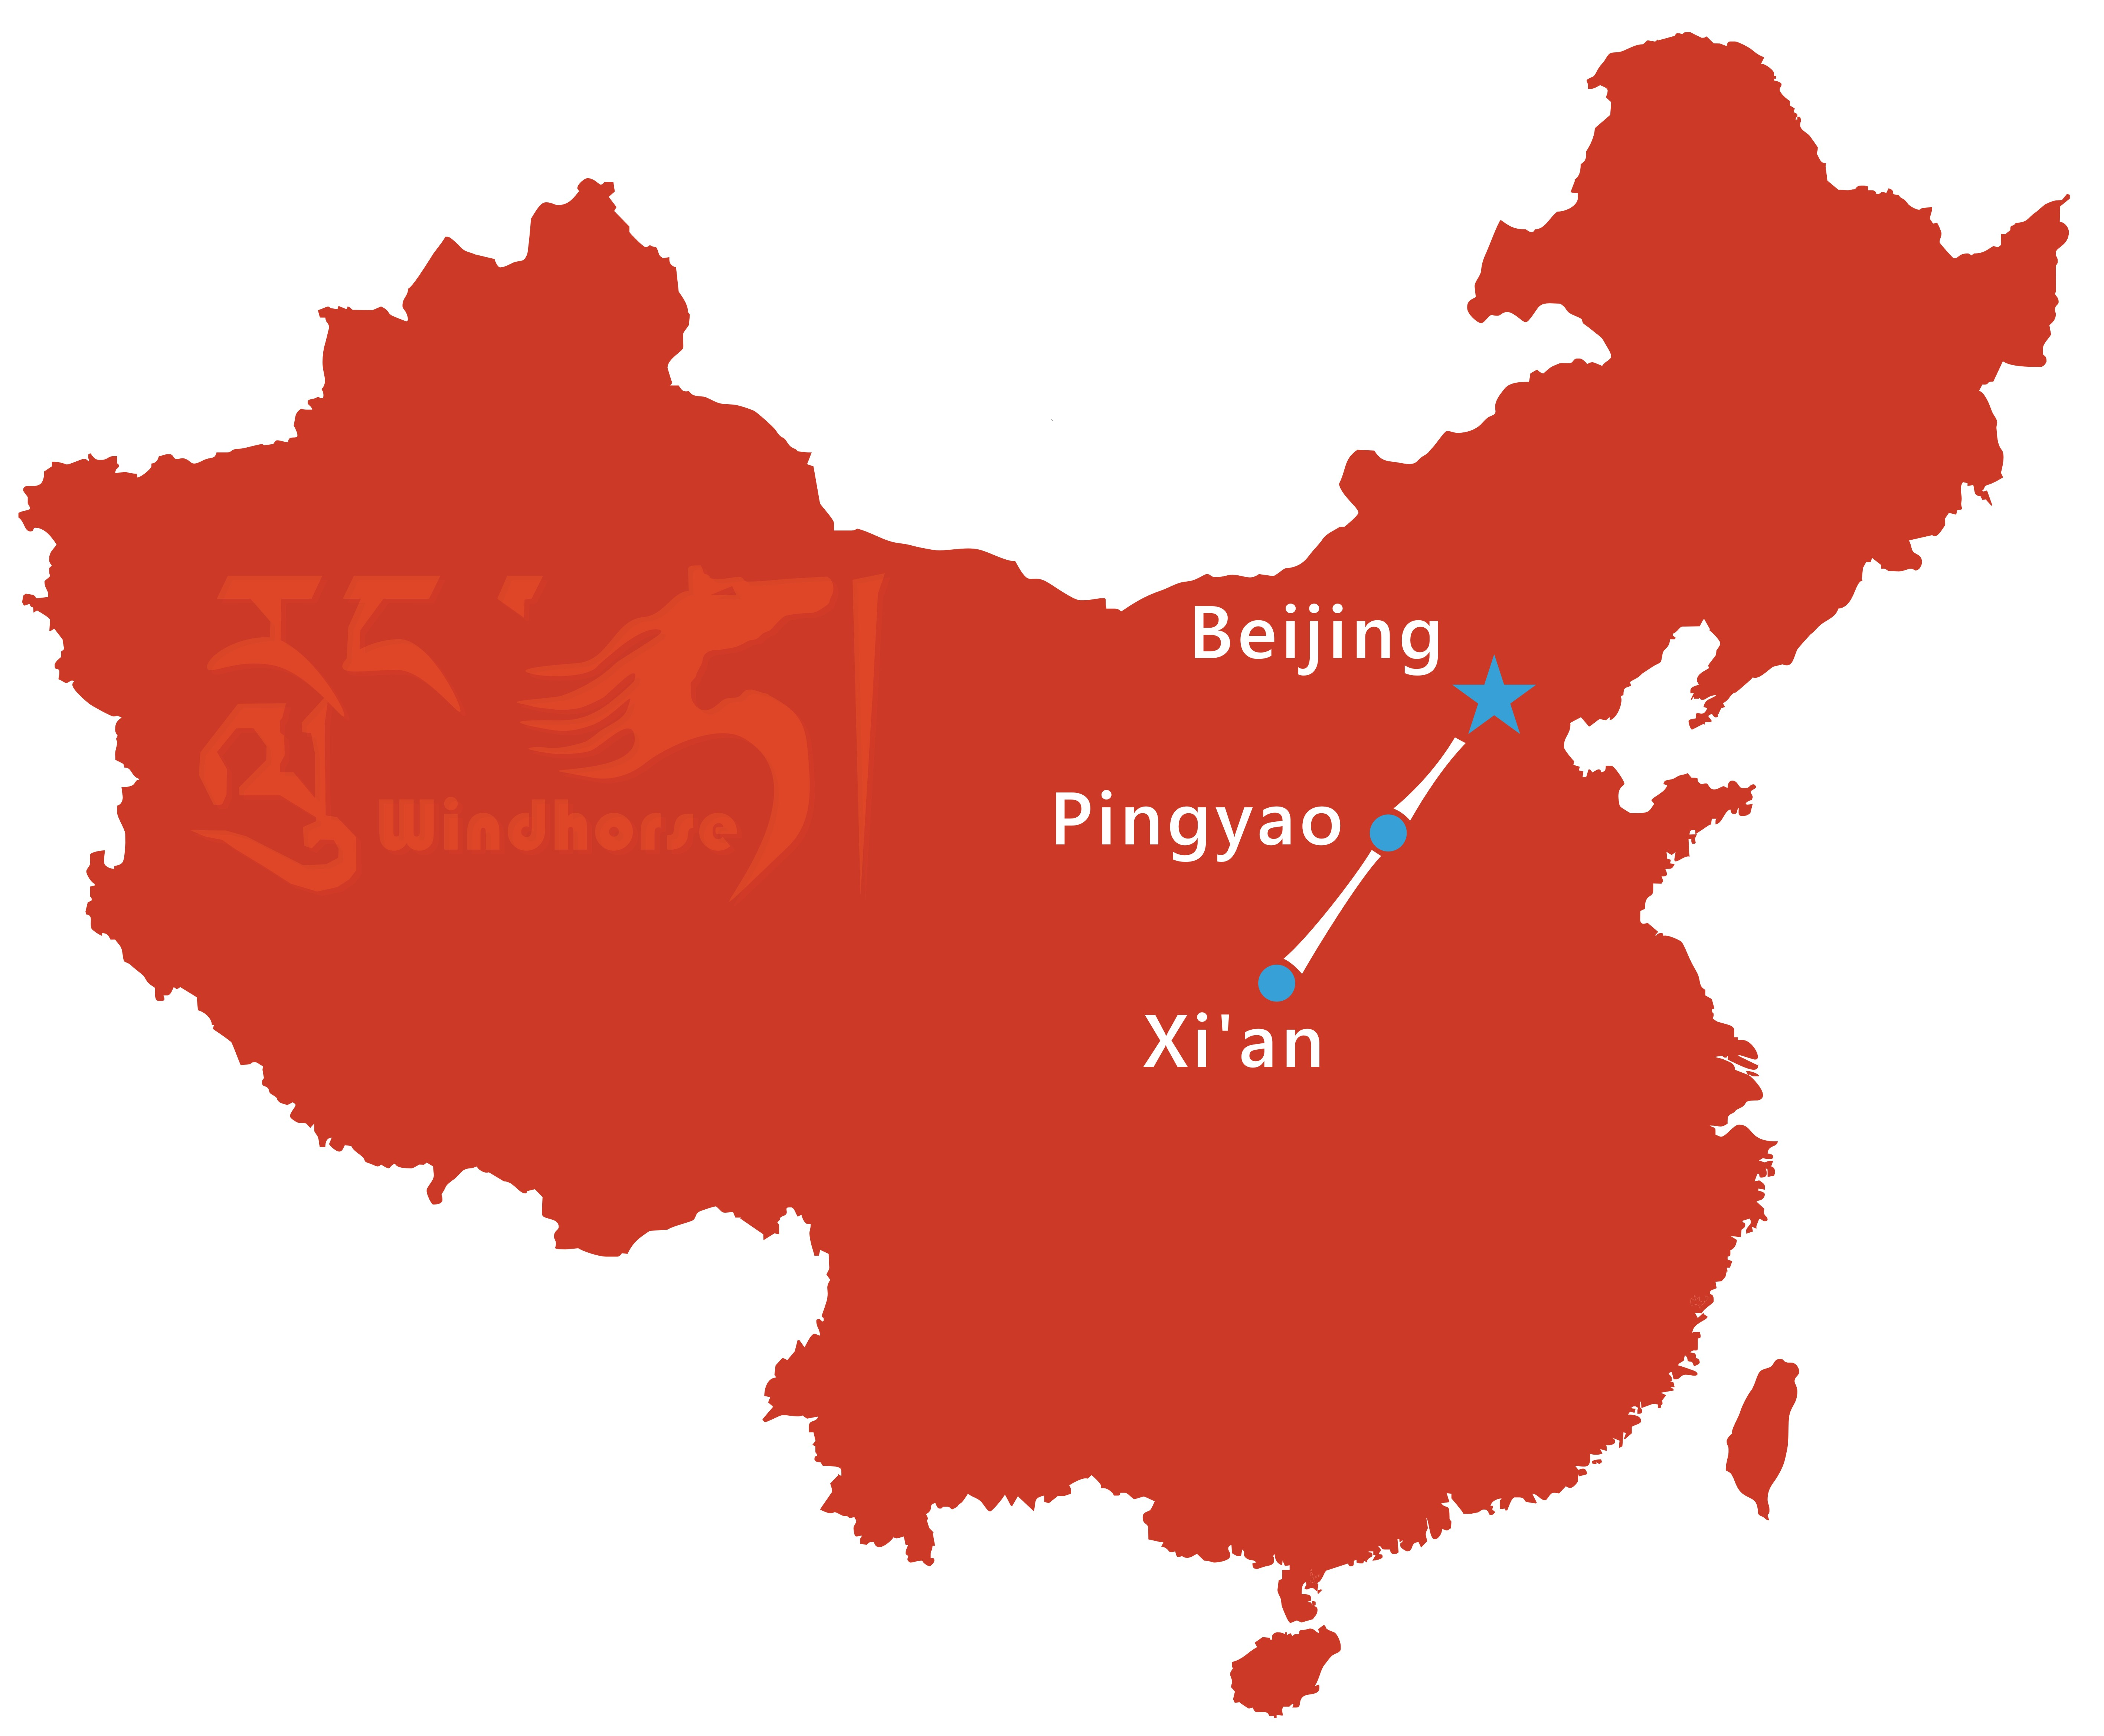 Pingyao Tour Route